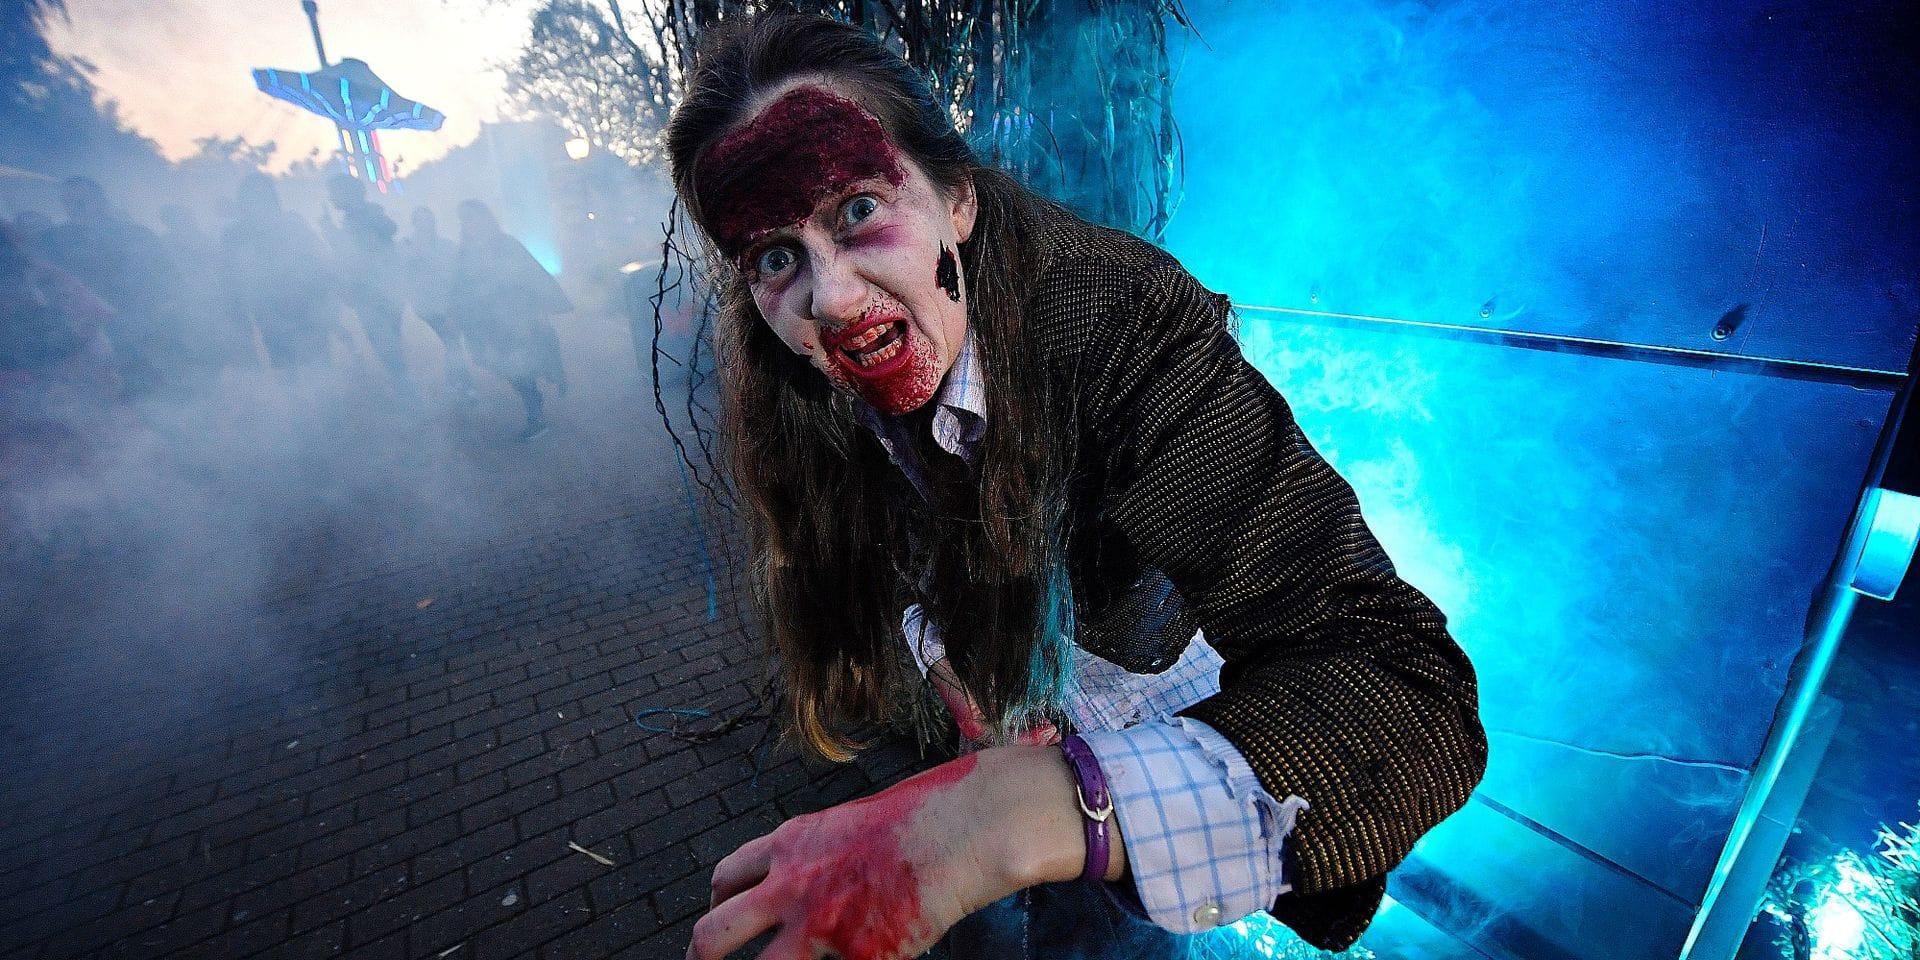 Walibi, Pairi Daiza, Mini-Europe & co: Halloween ne se démode pas dans les parcs